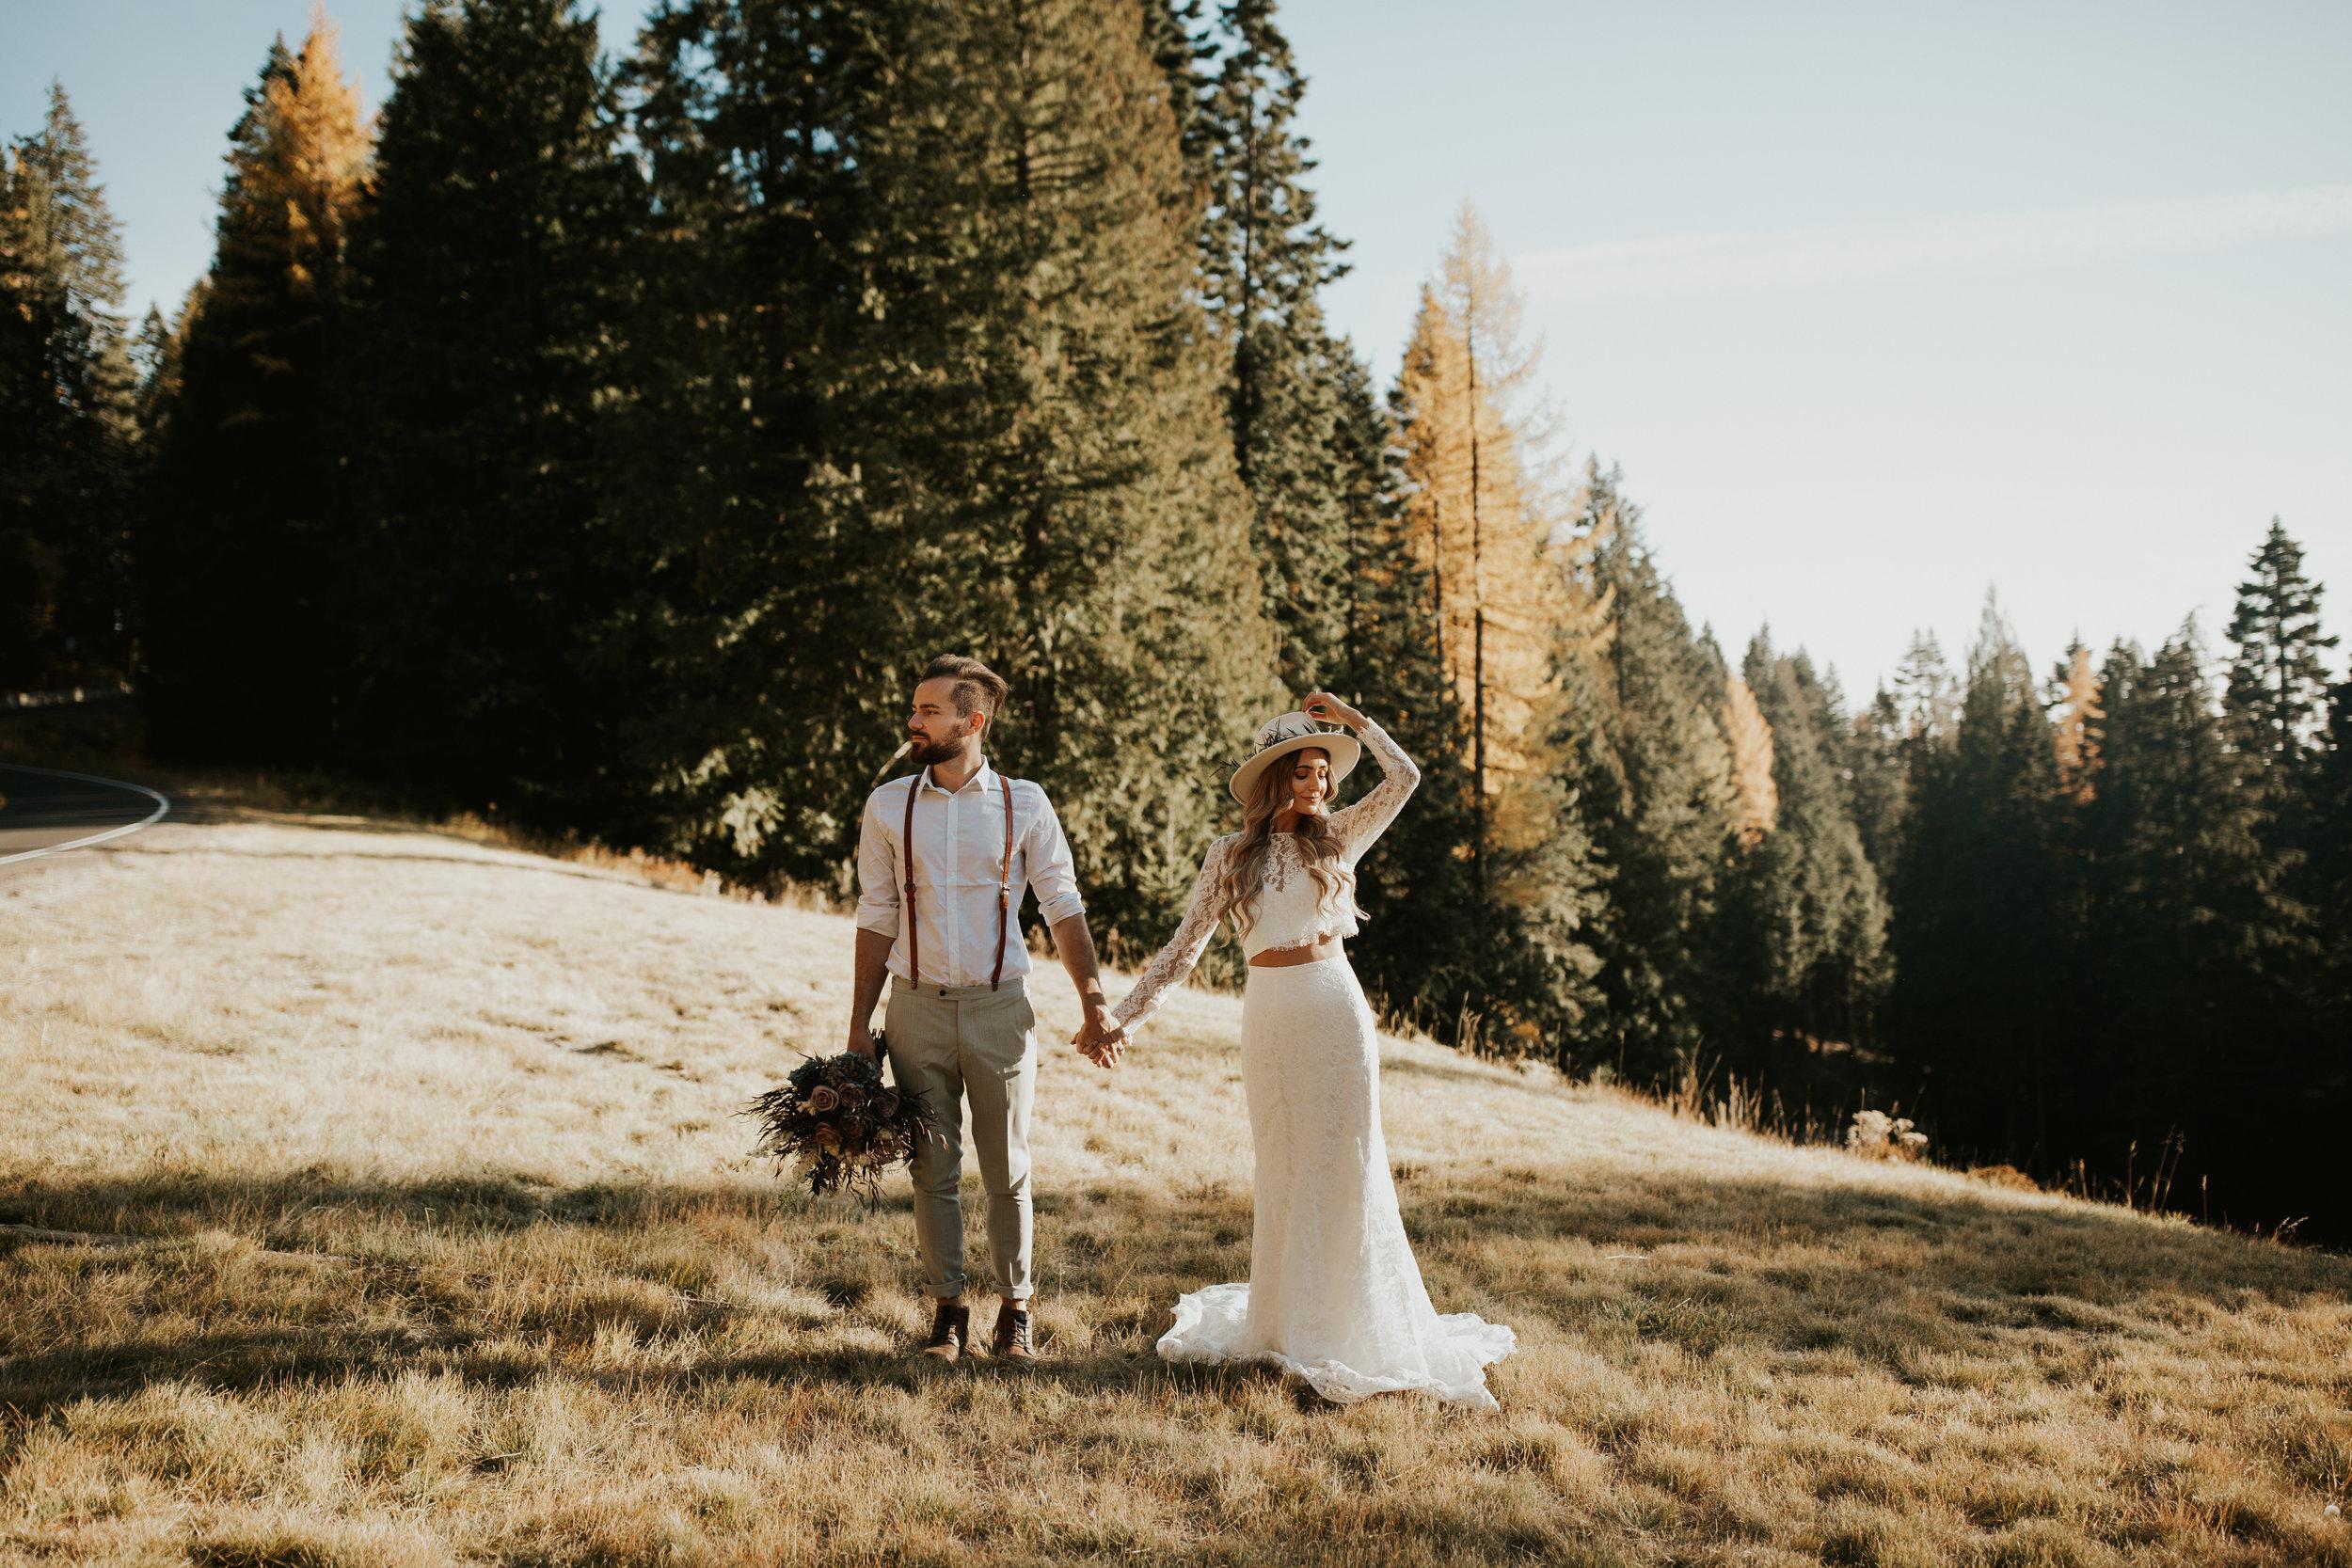 spokane photo shoot image fall inspiration